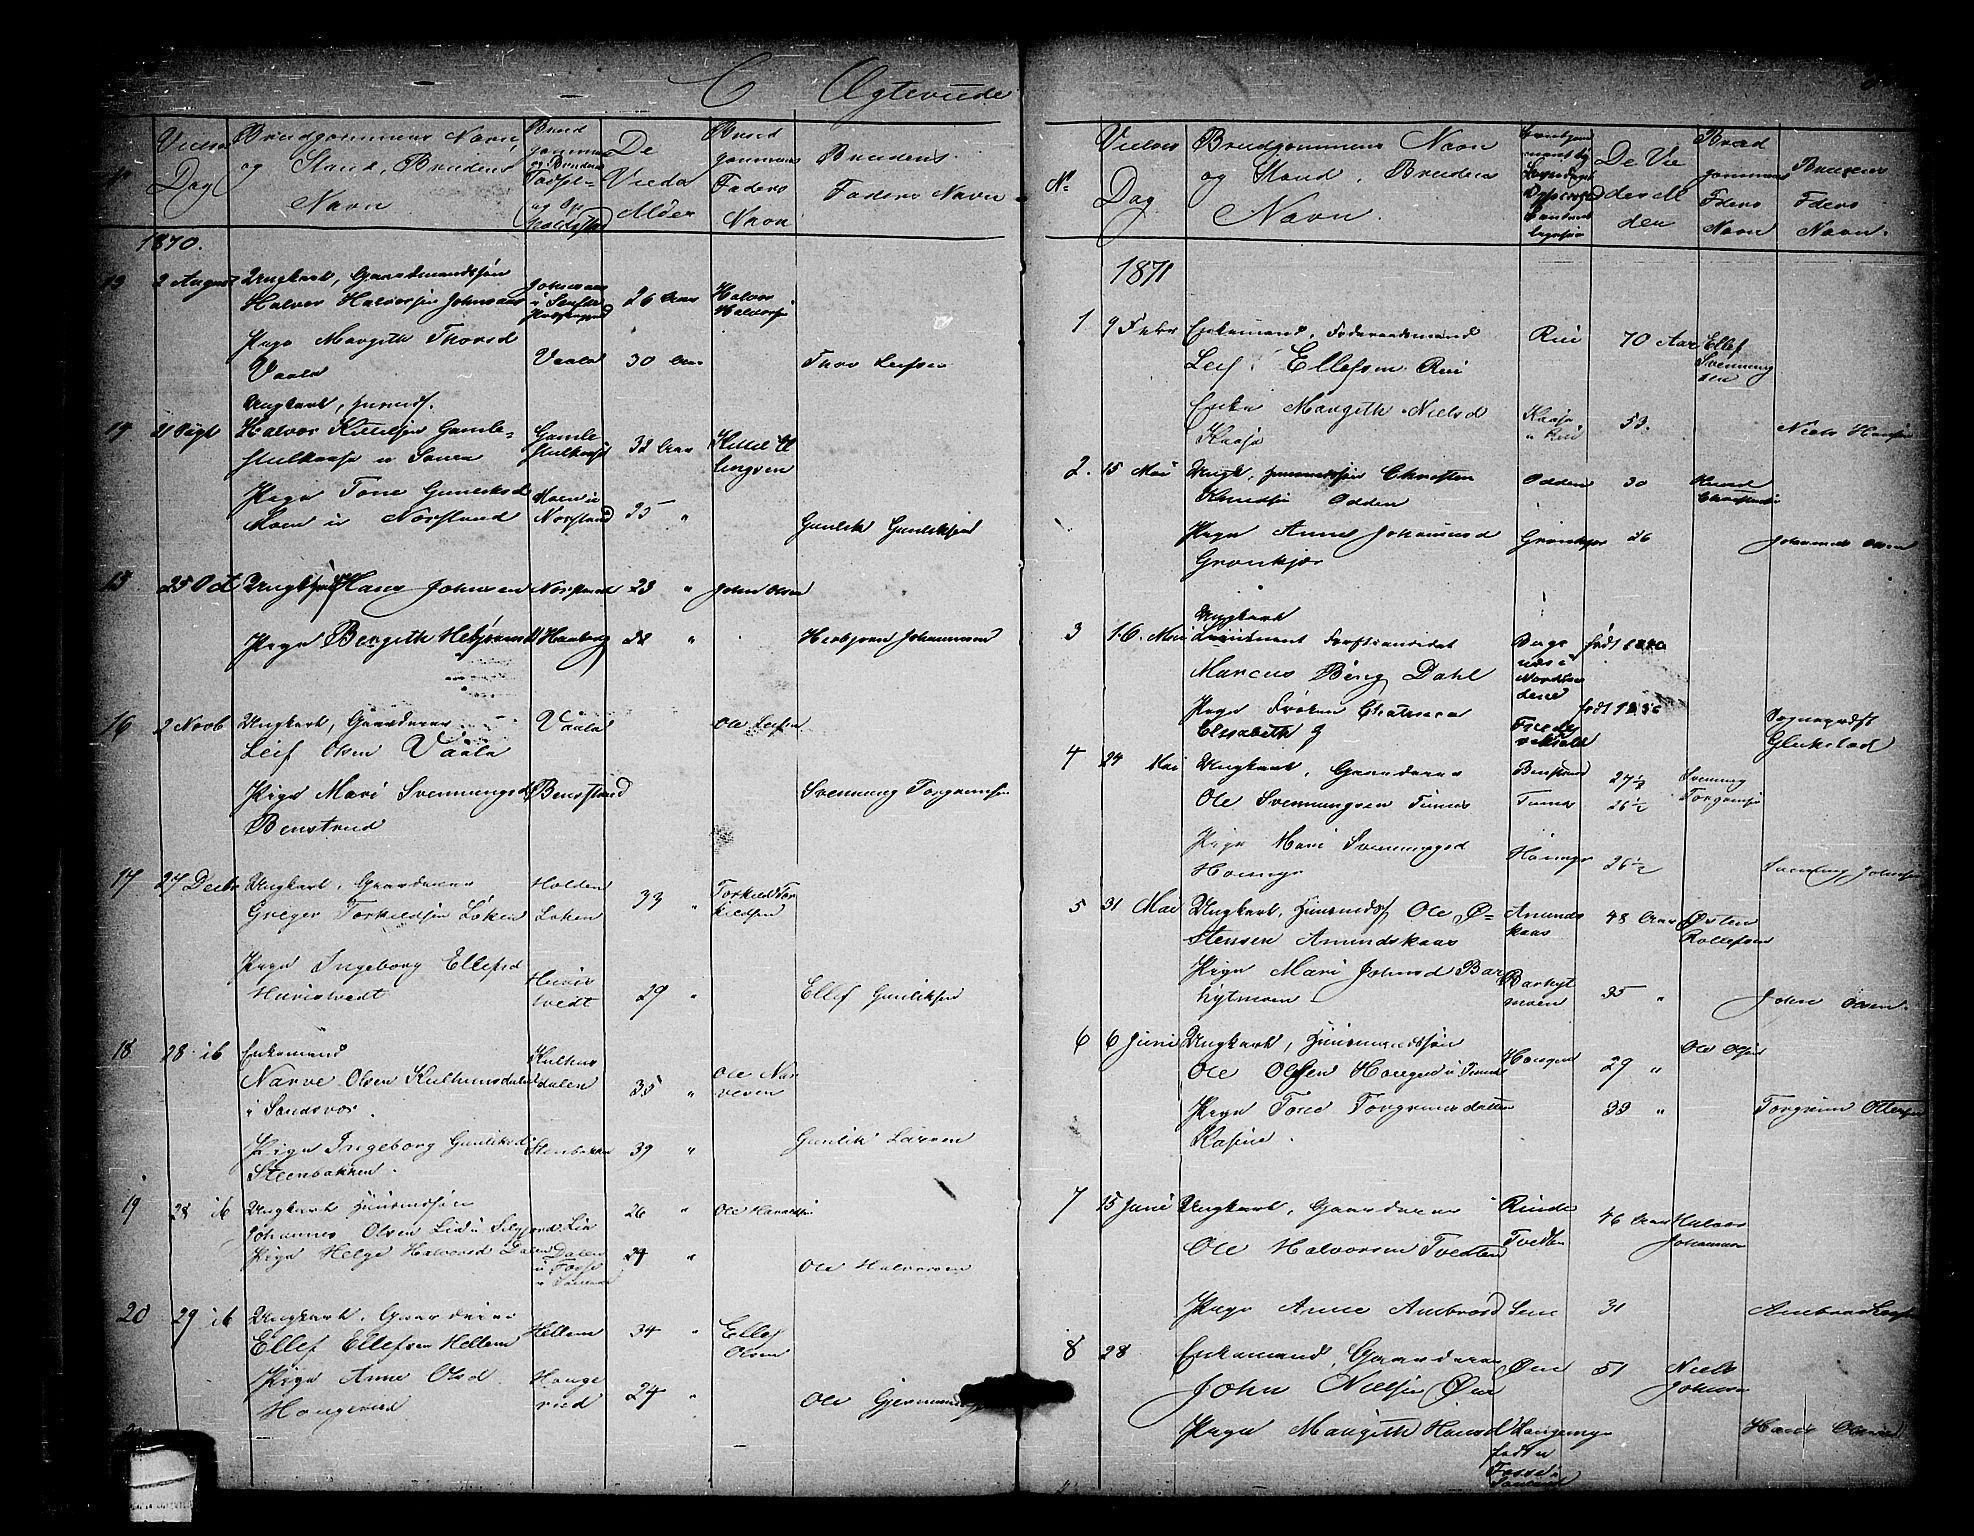 SAKO, Heddal kirkebøker, G/Ga/L0001: Klokkerbok nr. I 1, 1866-1878, s. 304-305